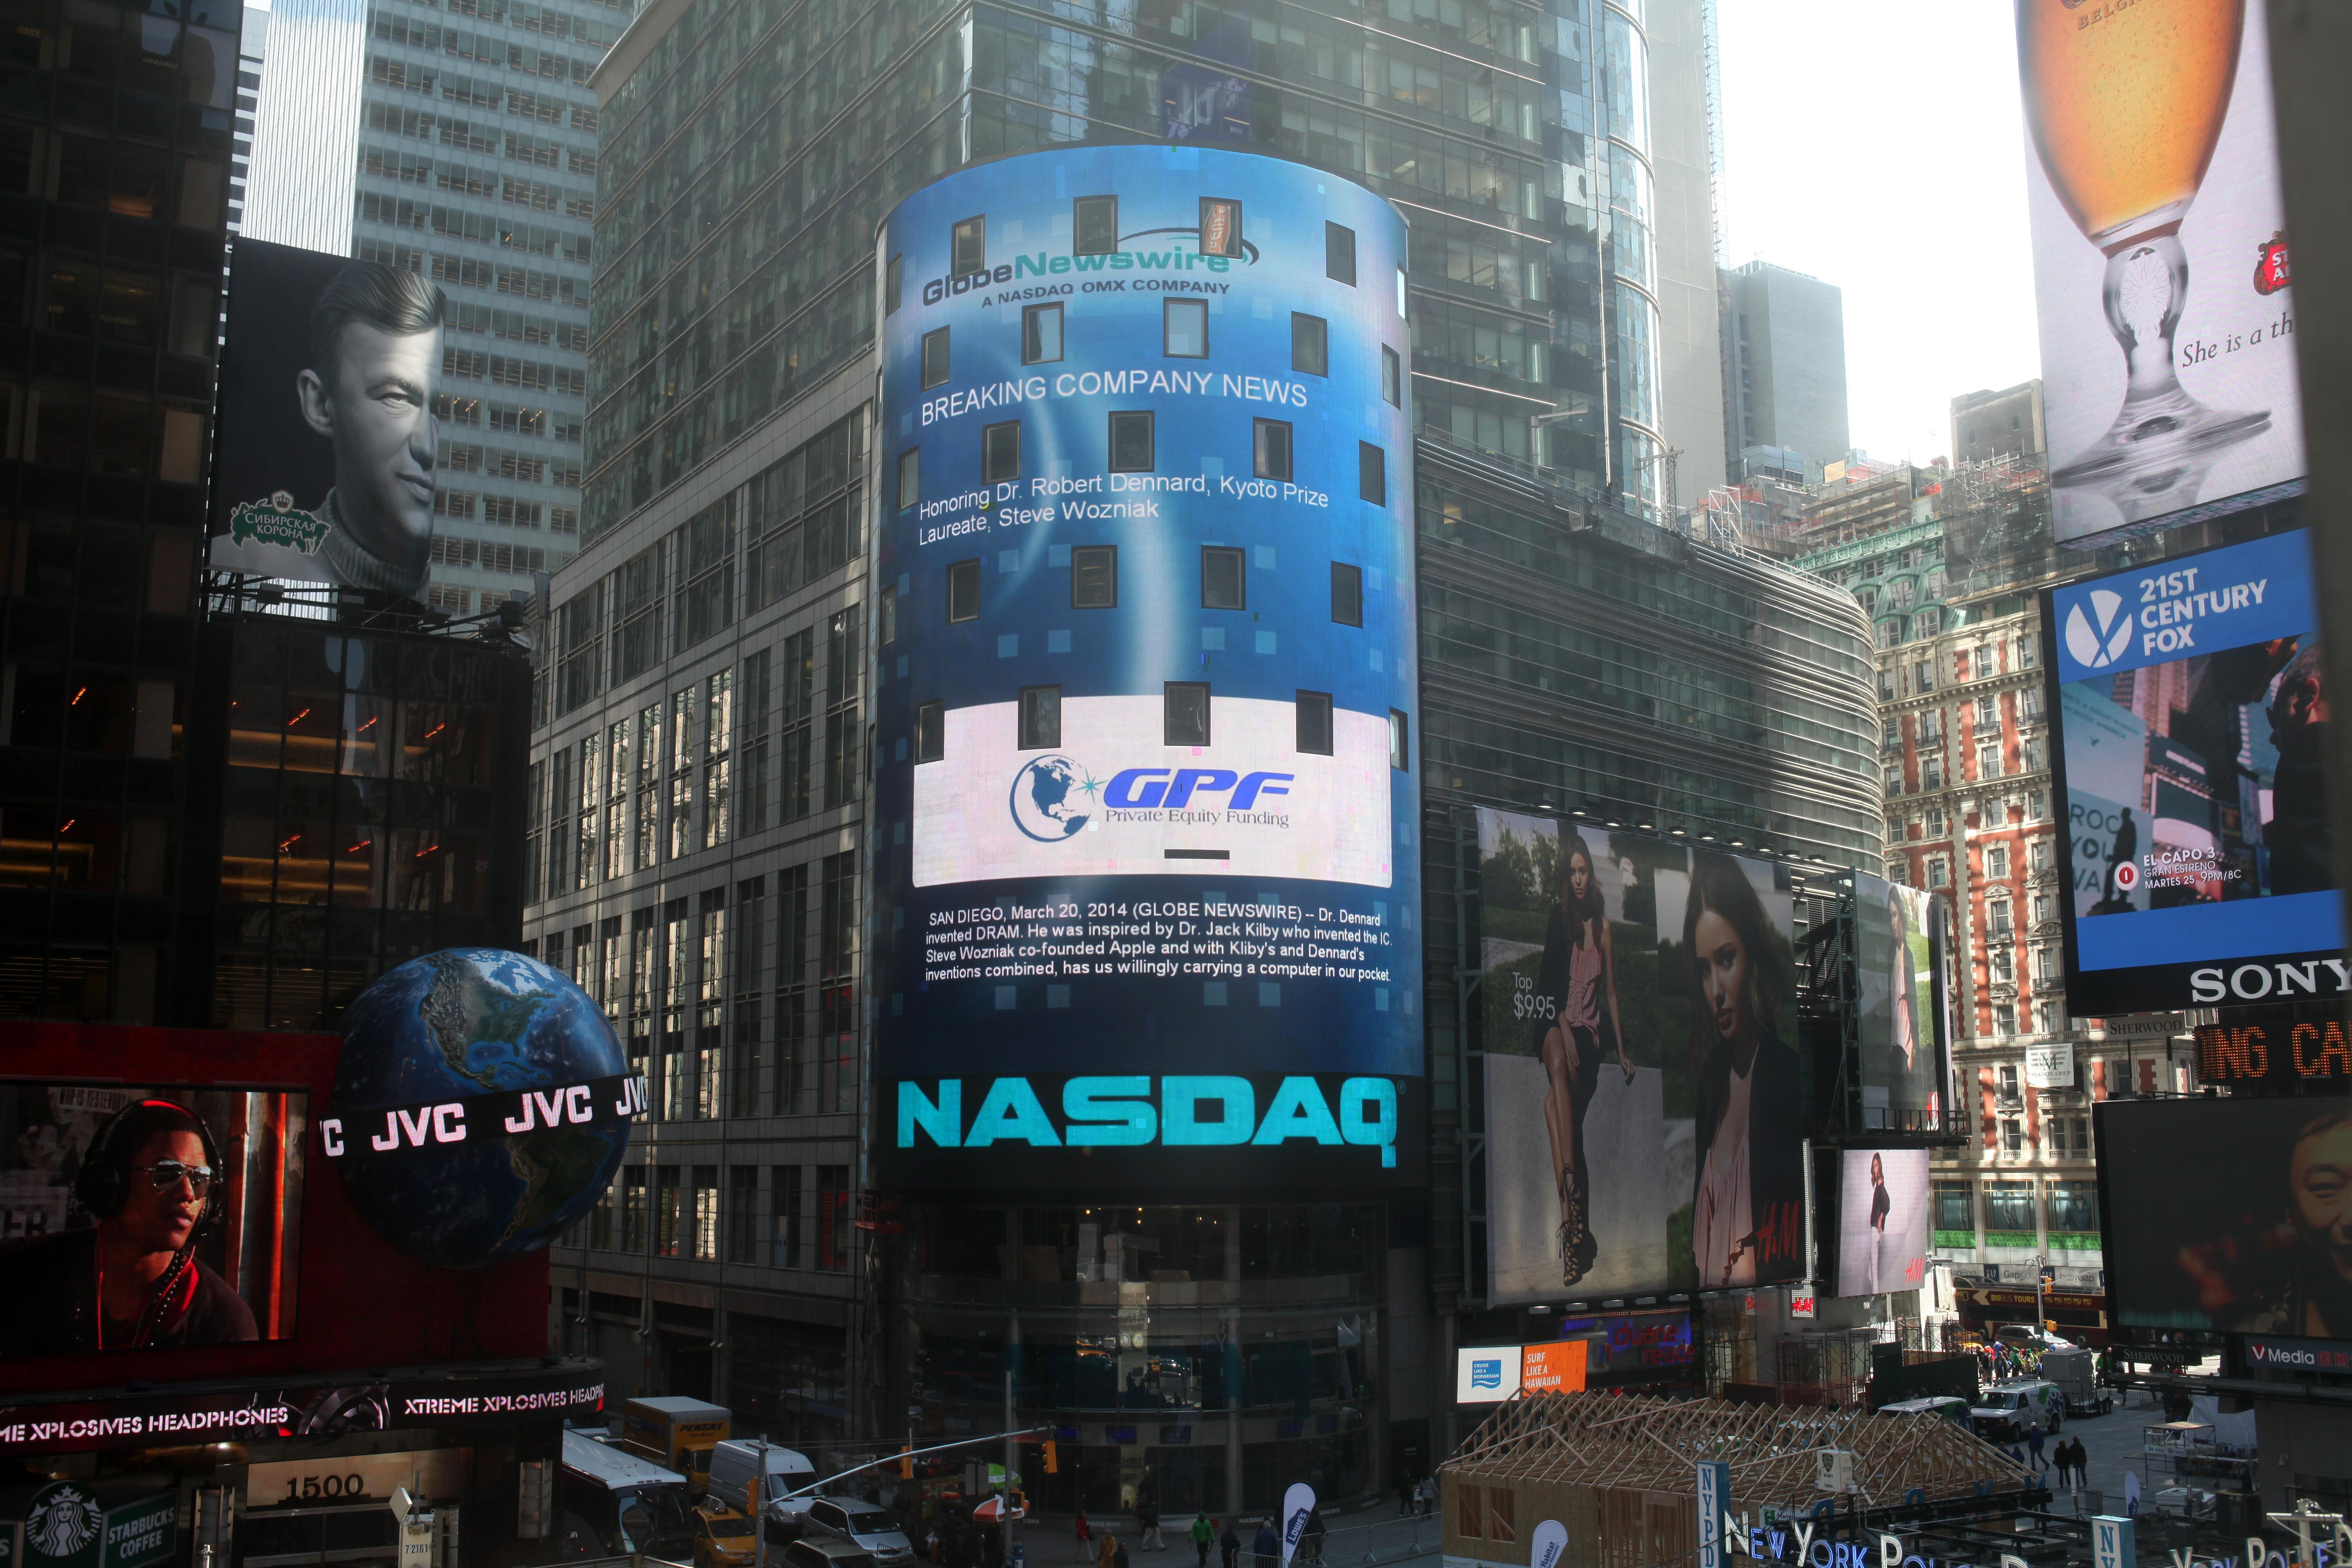 Dennard-Wozniak on NASDAQ Times Square